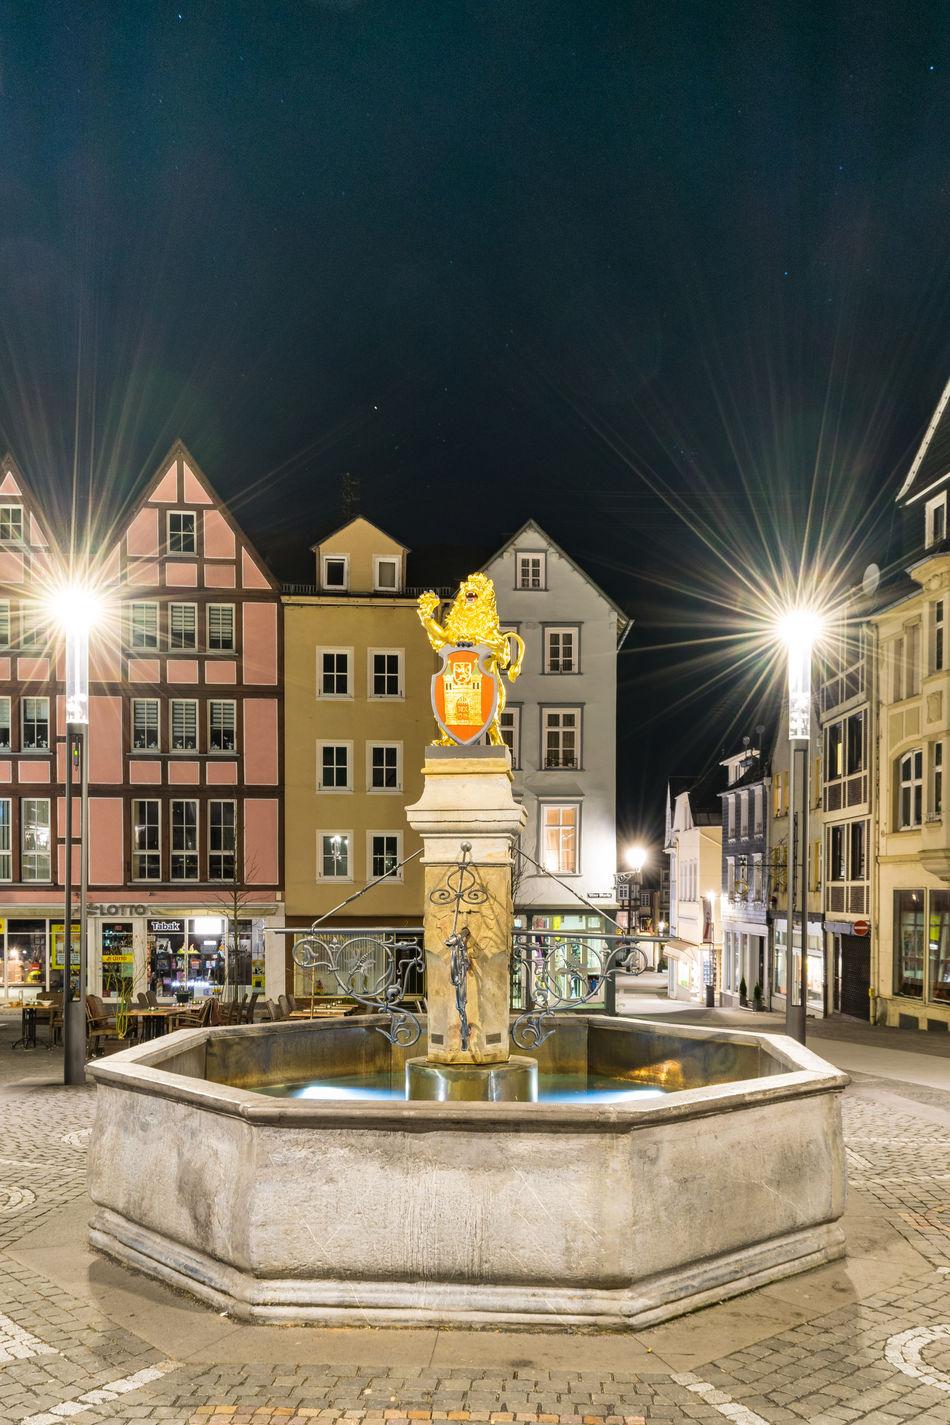 City night Architecture City Cityscape Fountain Hachenburg Illuminated Lion Night Nightphotography Sculpture Statue